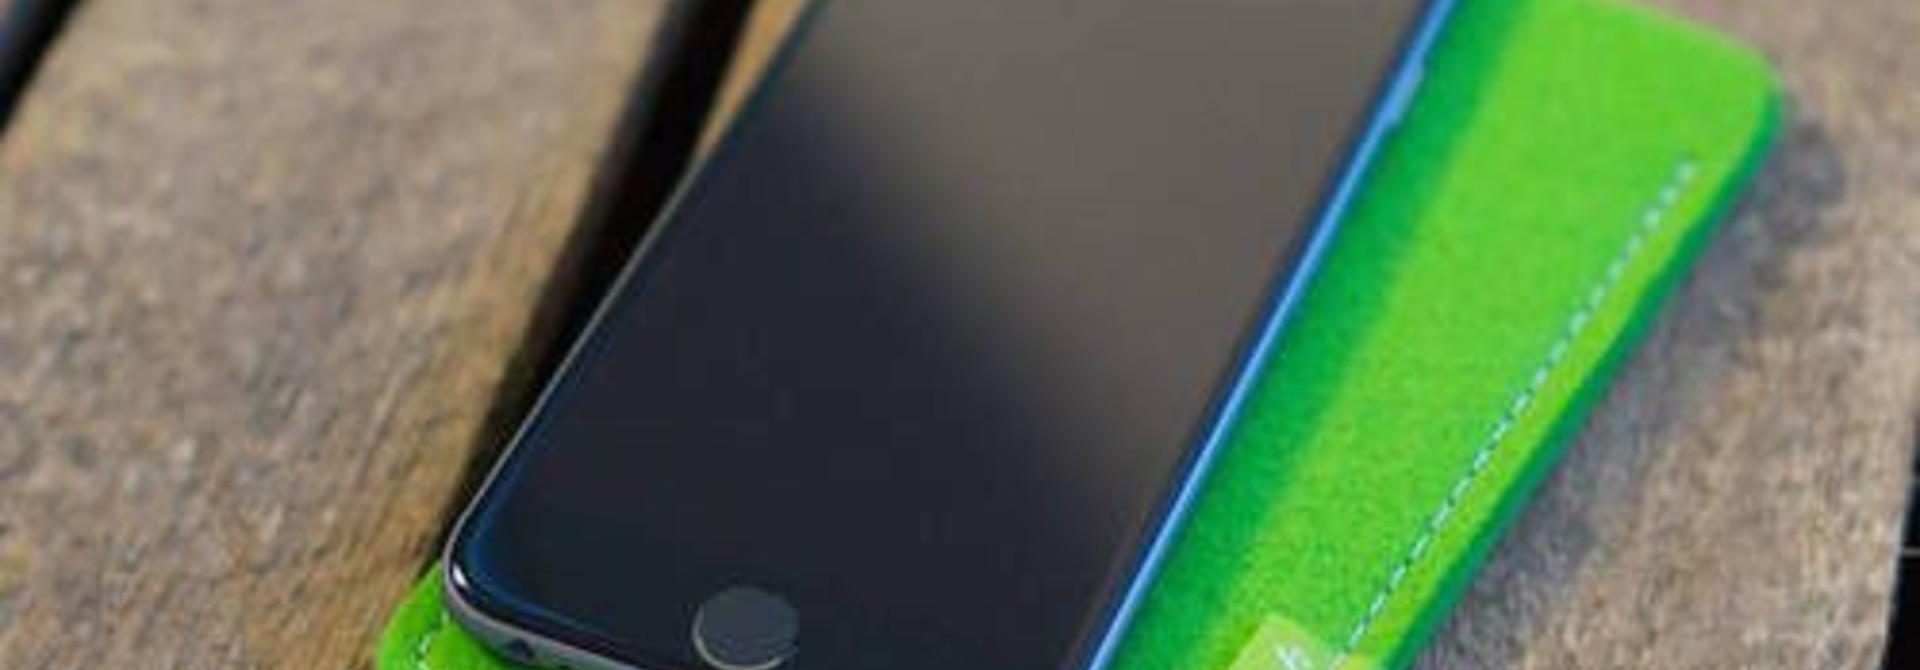 iPhone 6 / 6 Plus Sleeve Promo Video